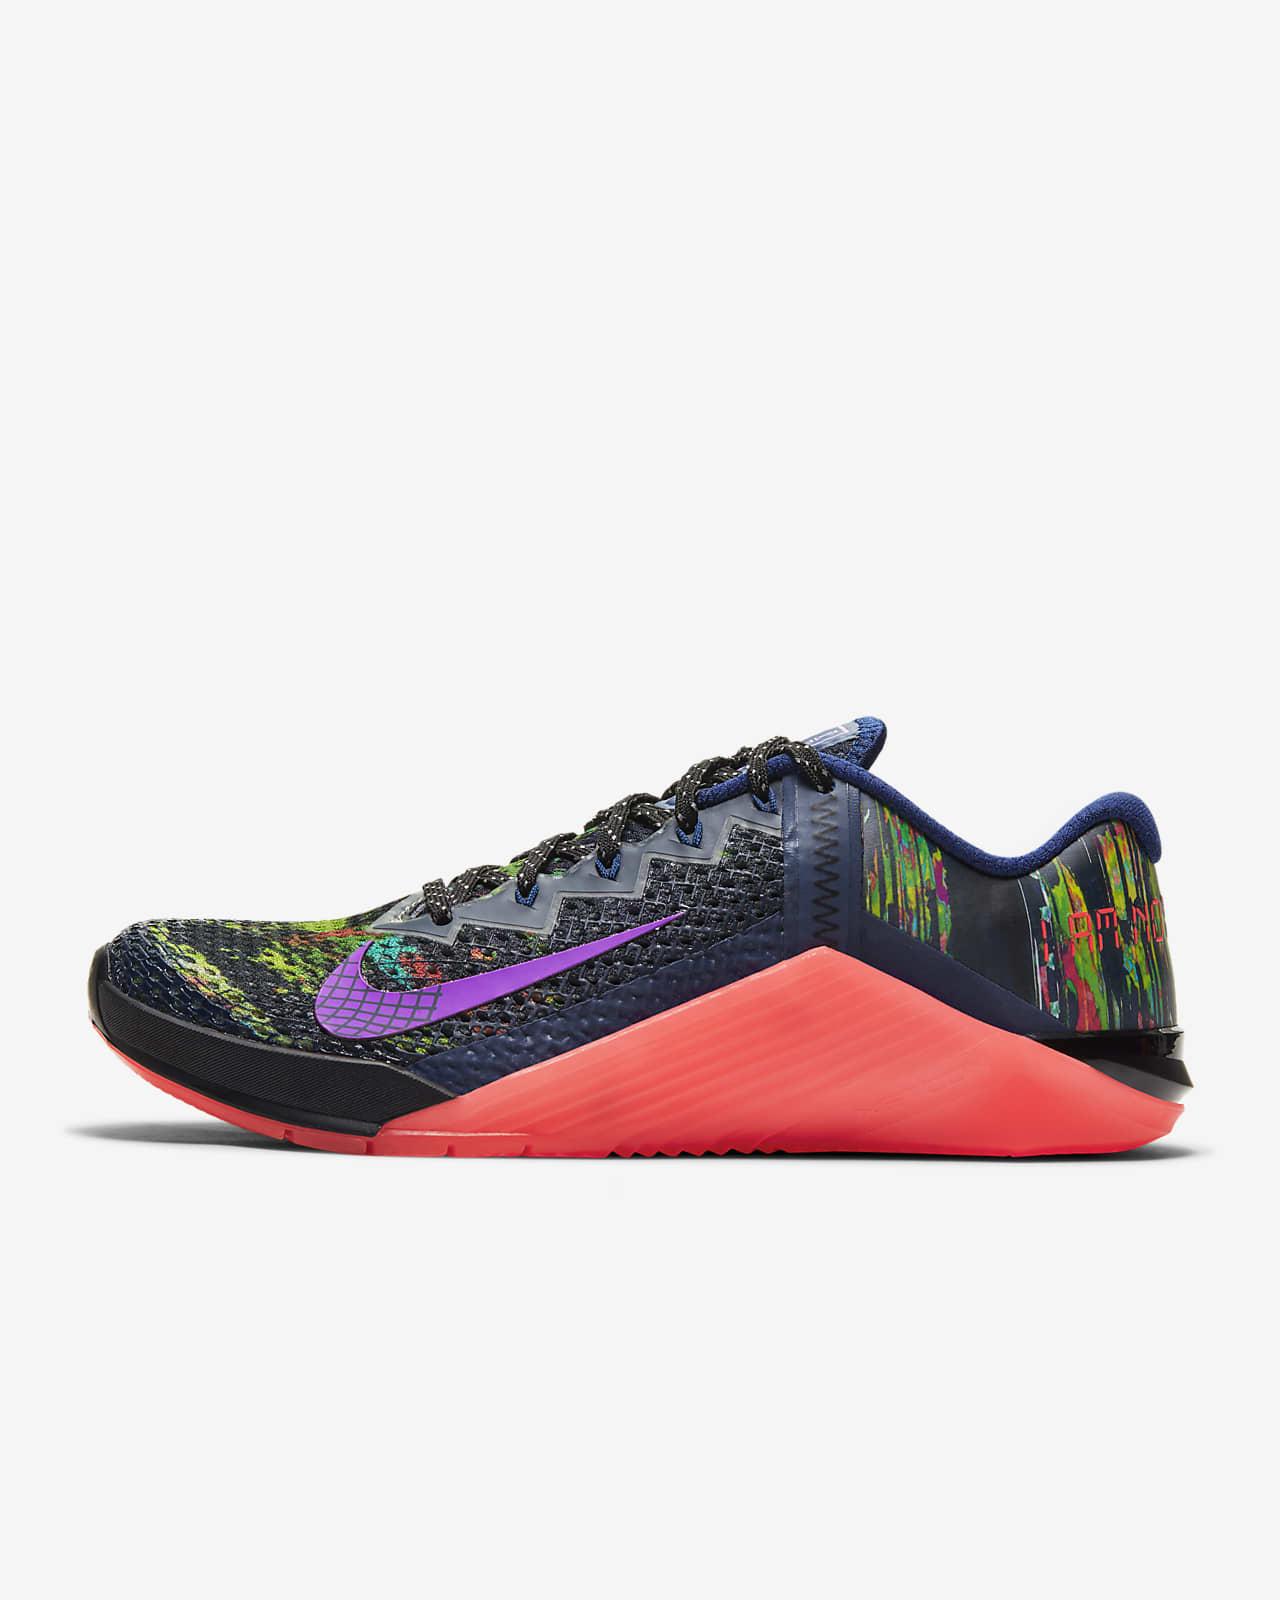 Sapatilhas de treino Nike Metcon 6 AMP para mulher